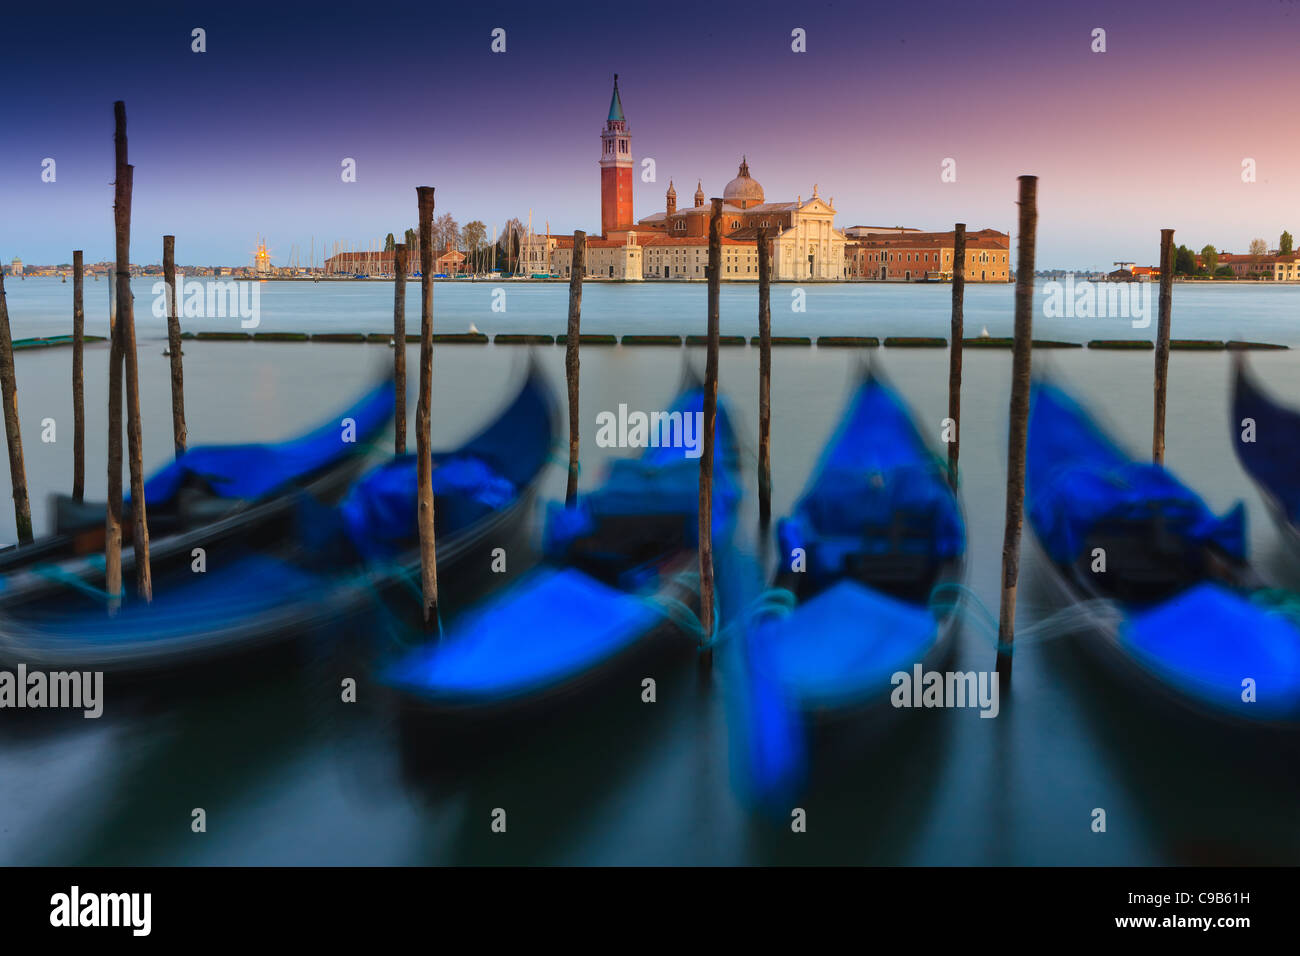 Sunrise in Venice with the view from San Marco square towards San Giorgio Maggiore - Stock Image